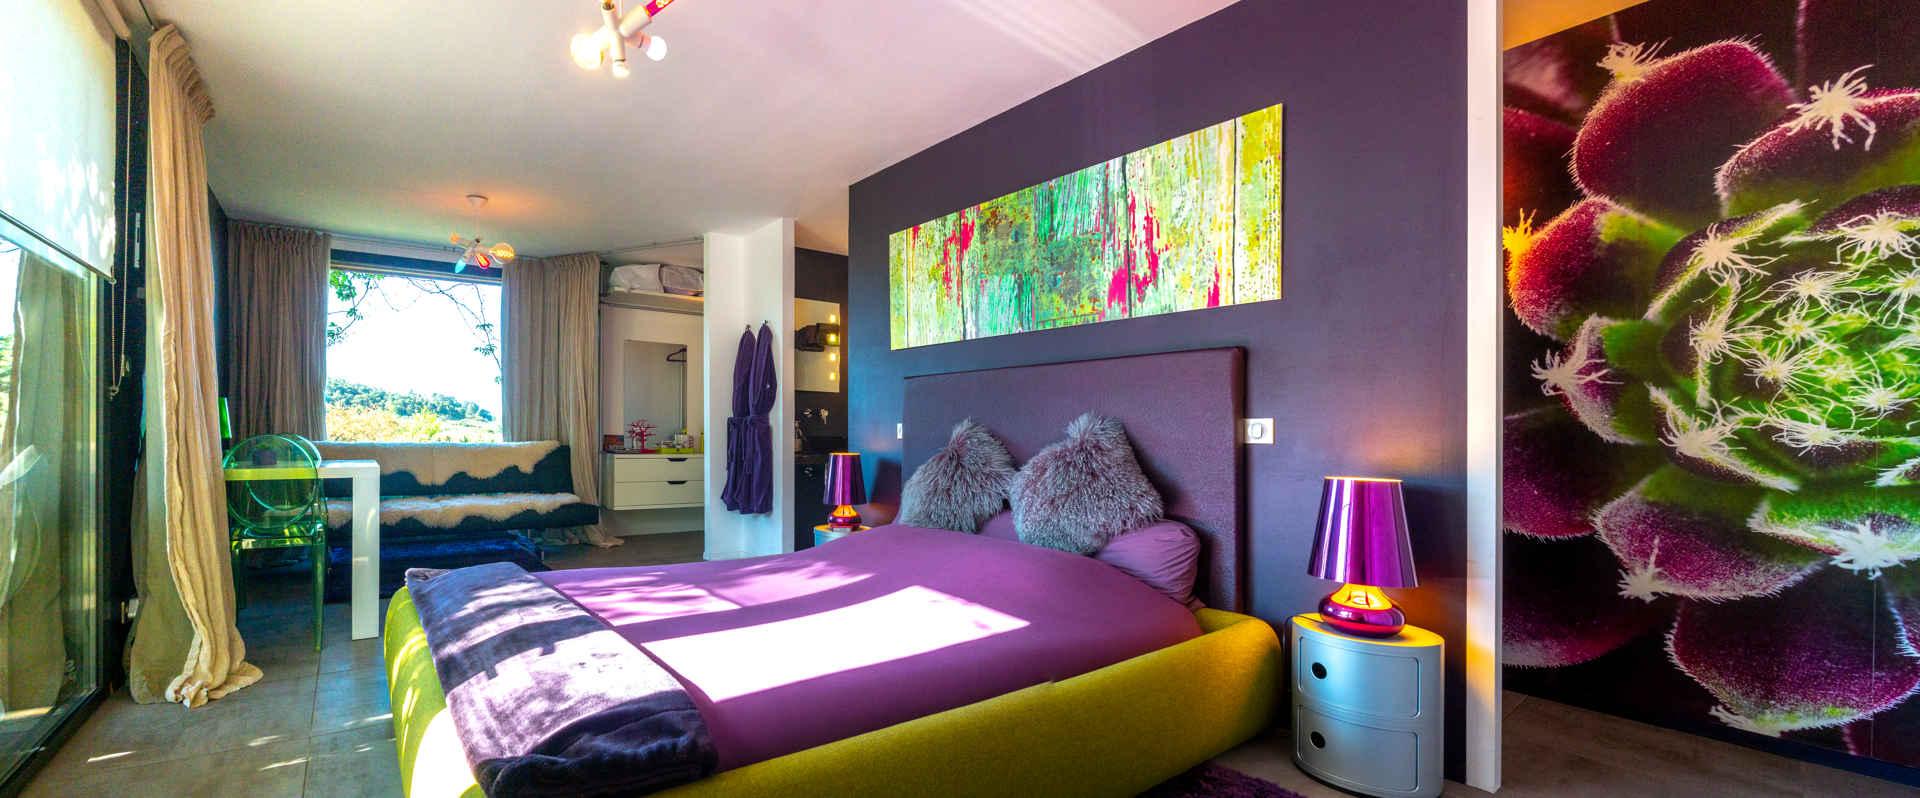 B&B Dochavert – Chambres d'hôtes à Carcassonne